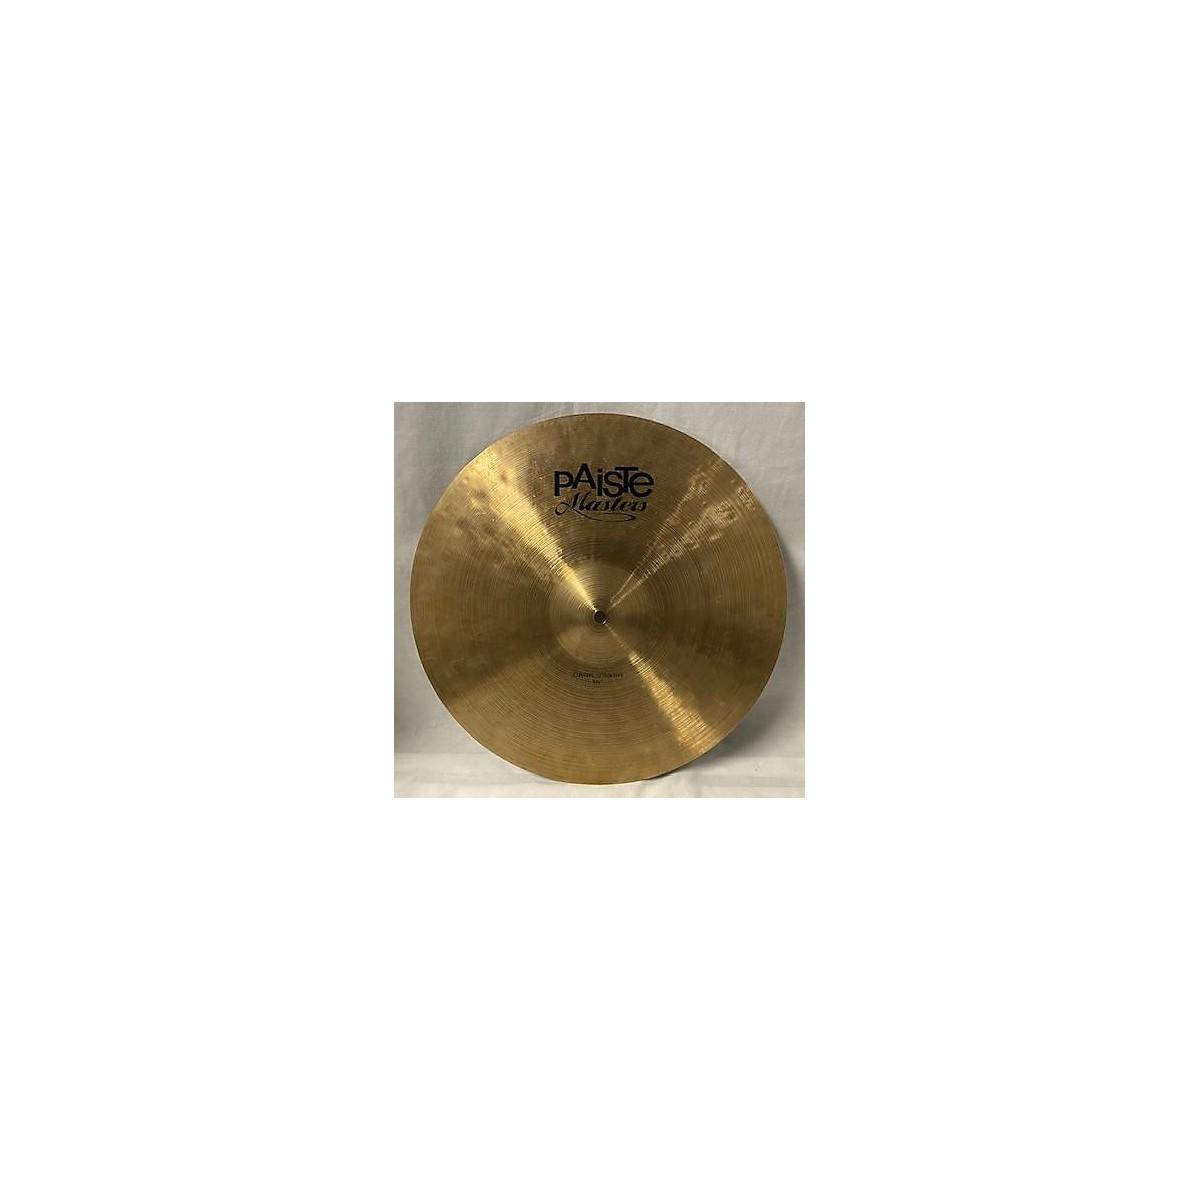 Paiste 16in MASTERS DARK CRASH Cymbal